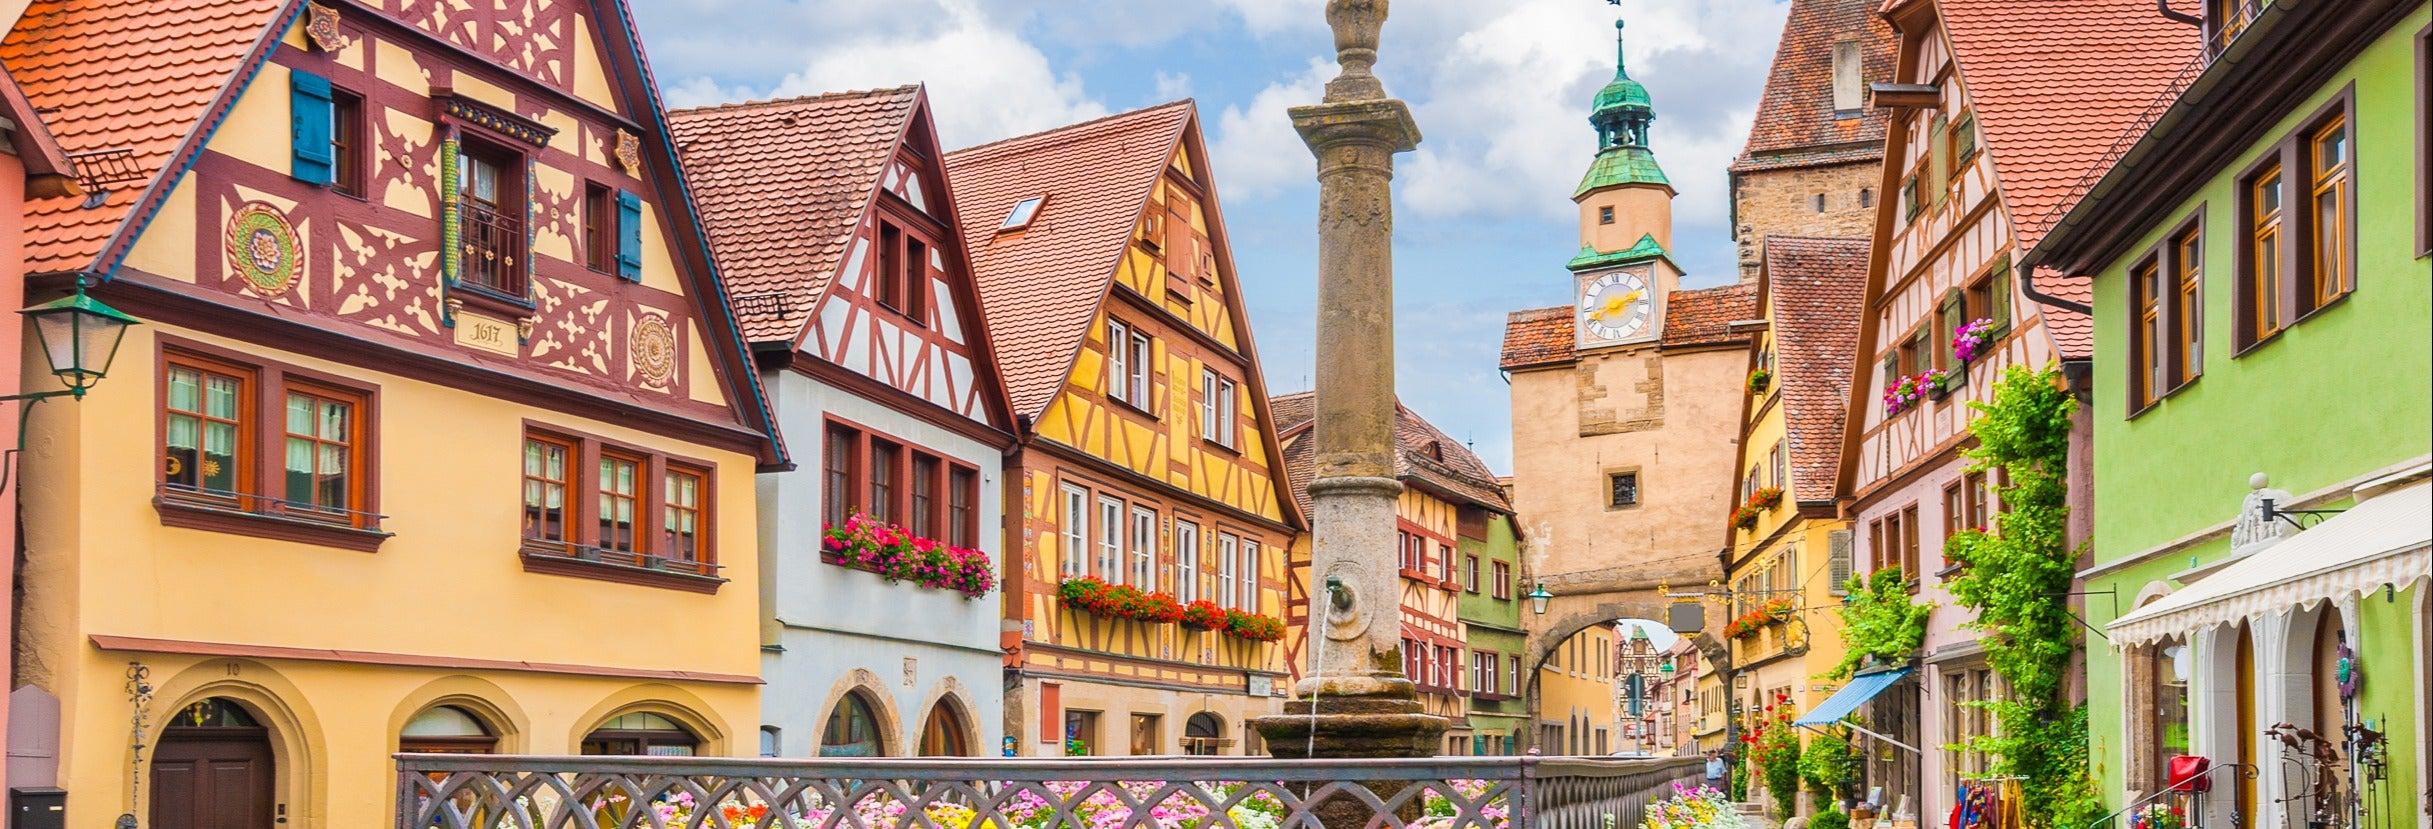 Excursión a Rotemburgo